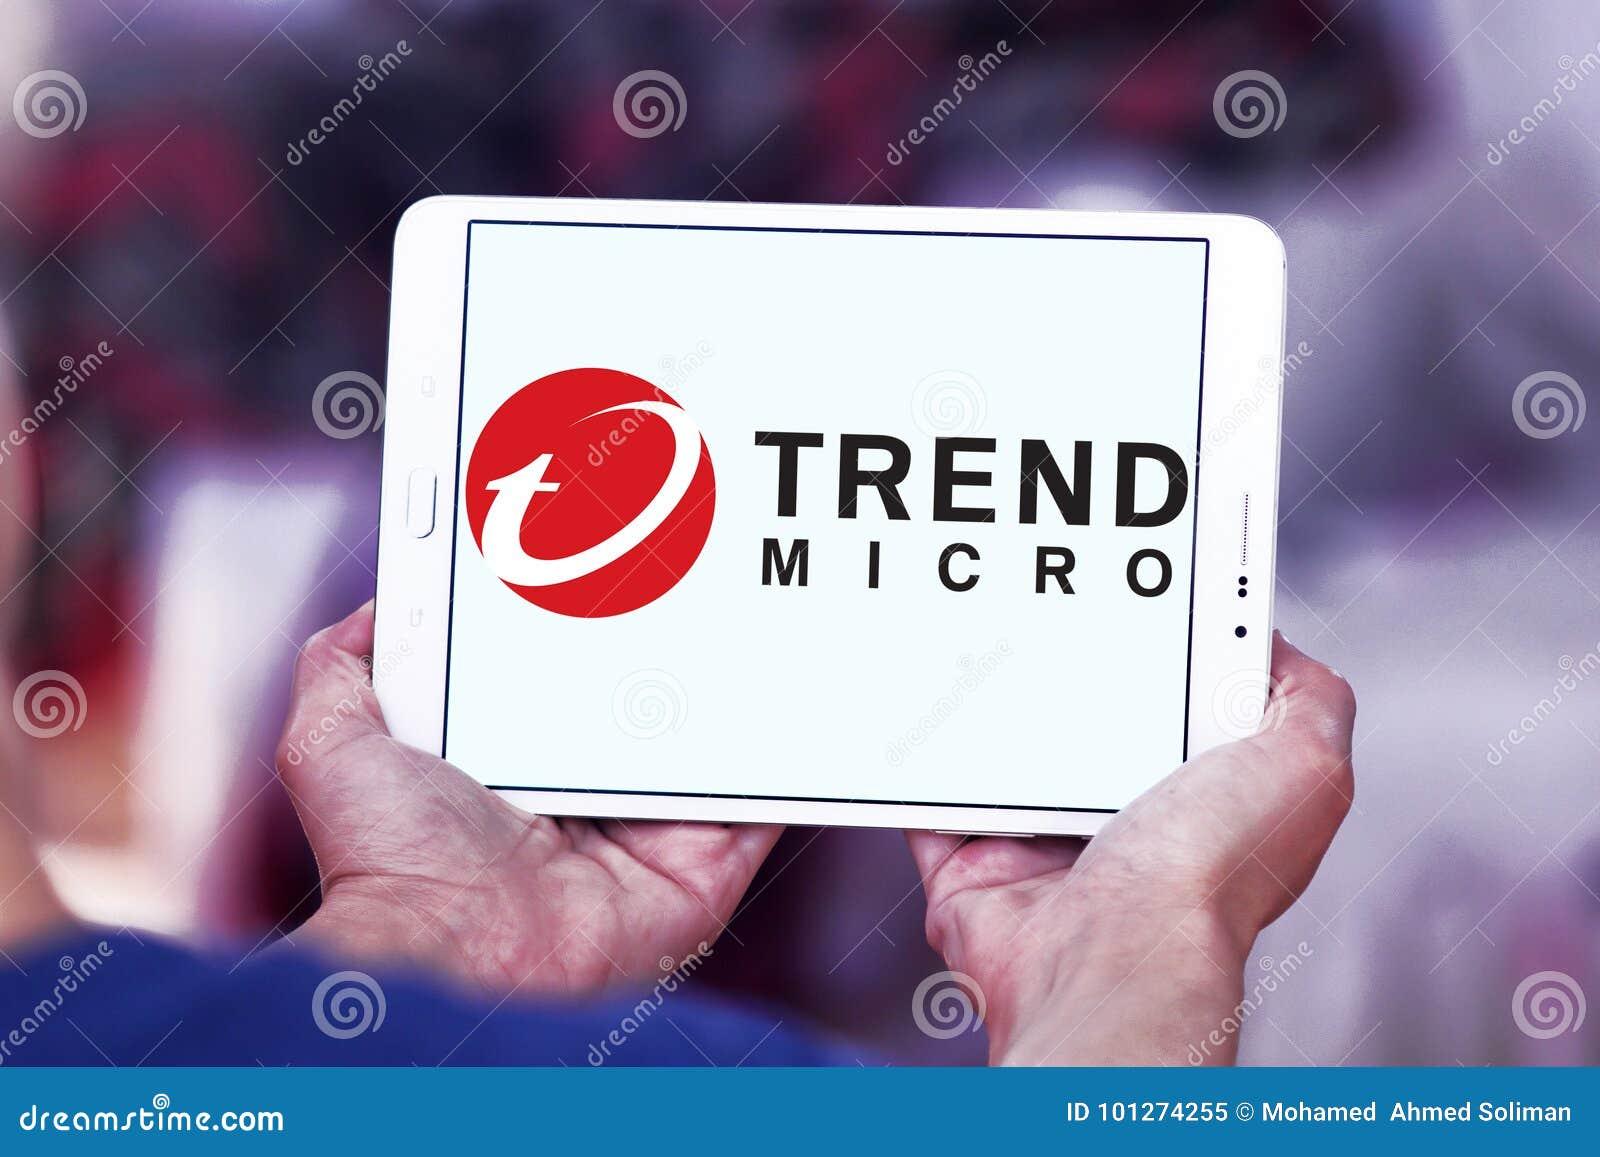 Trend Micro company logo editorial image  Image of avast